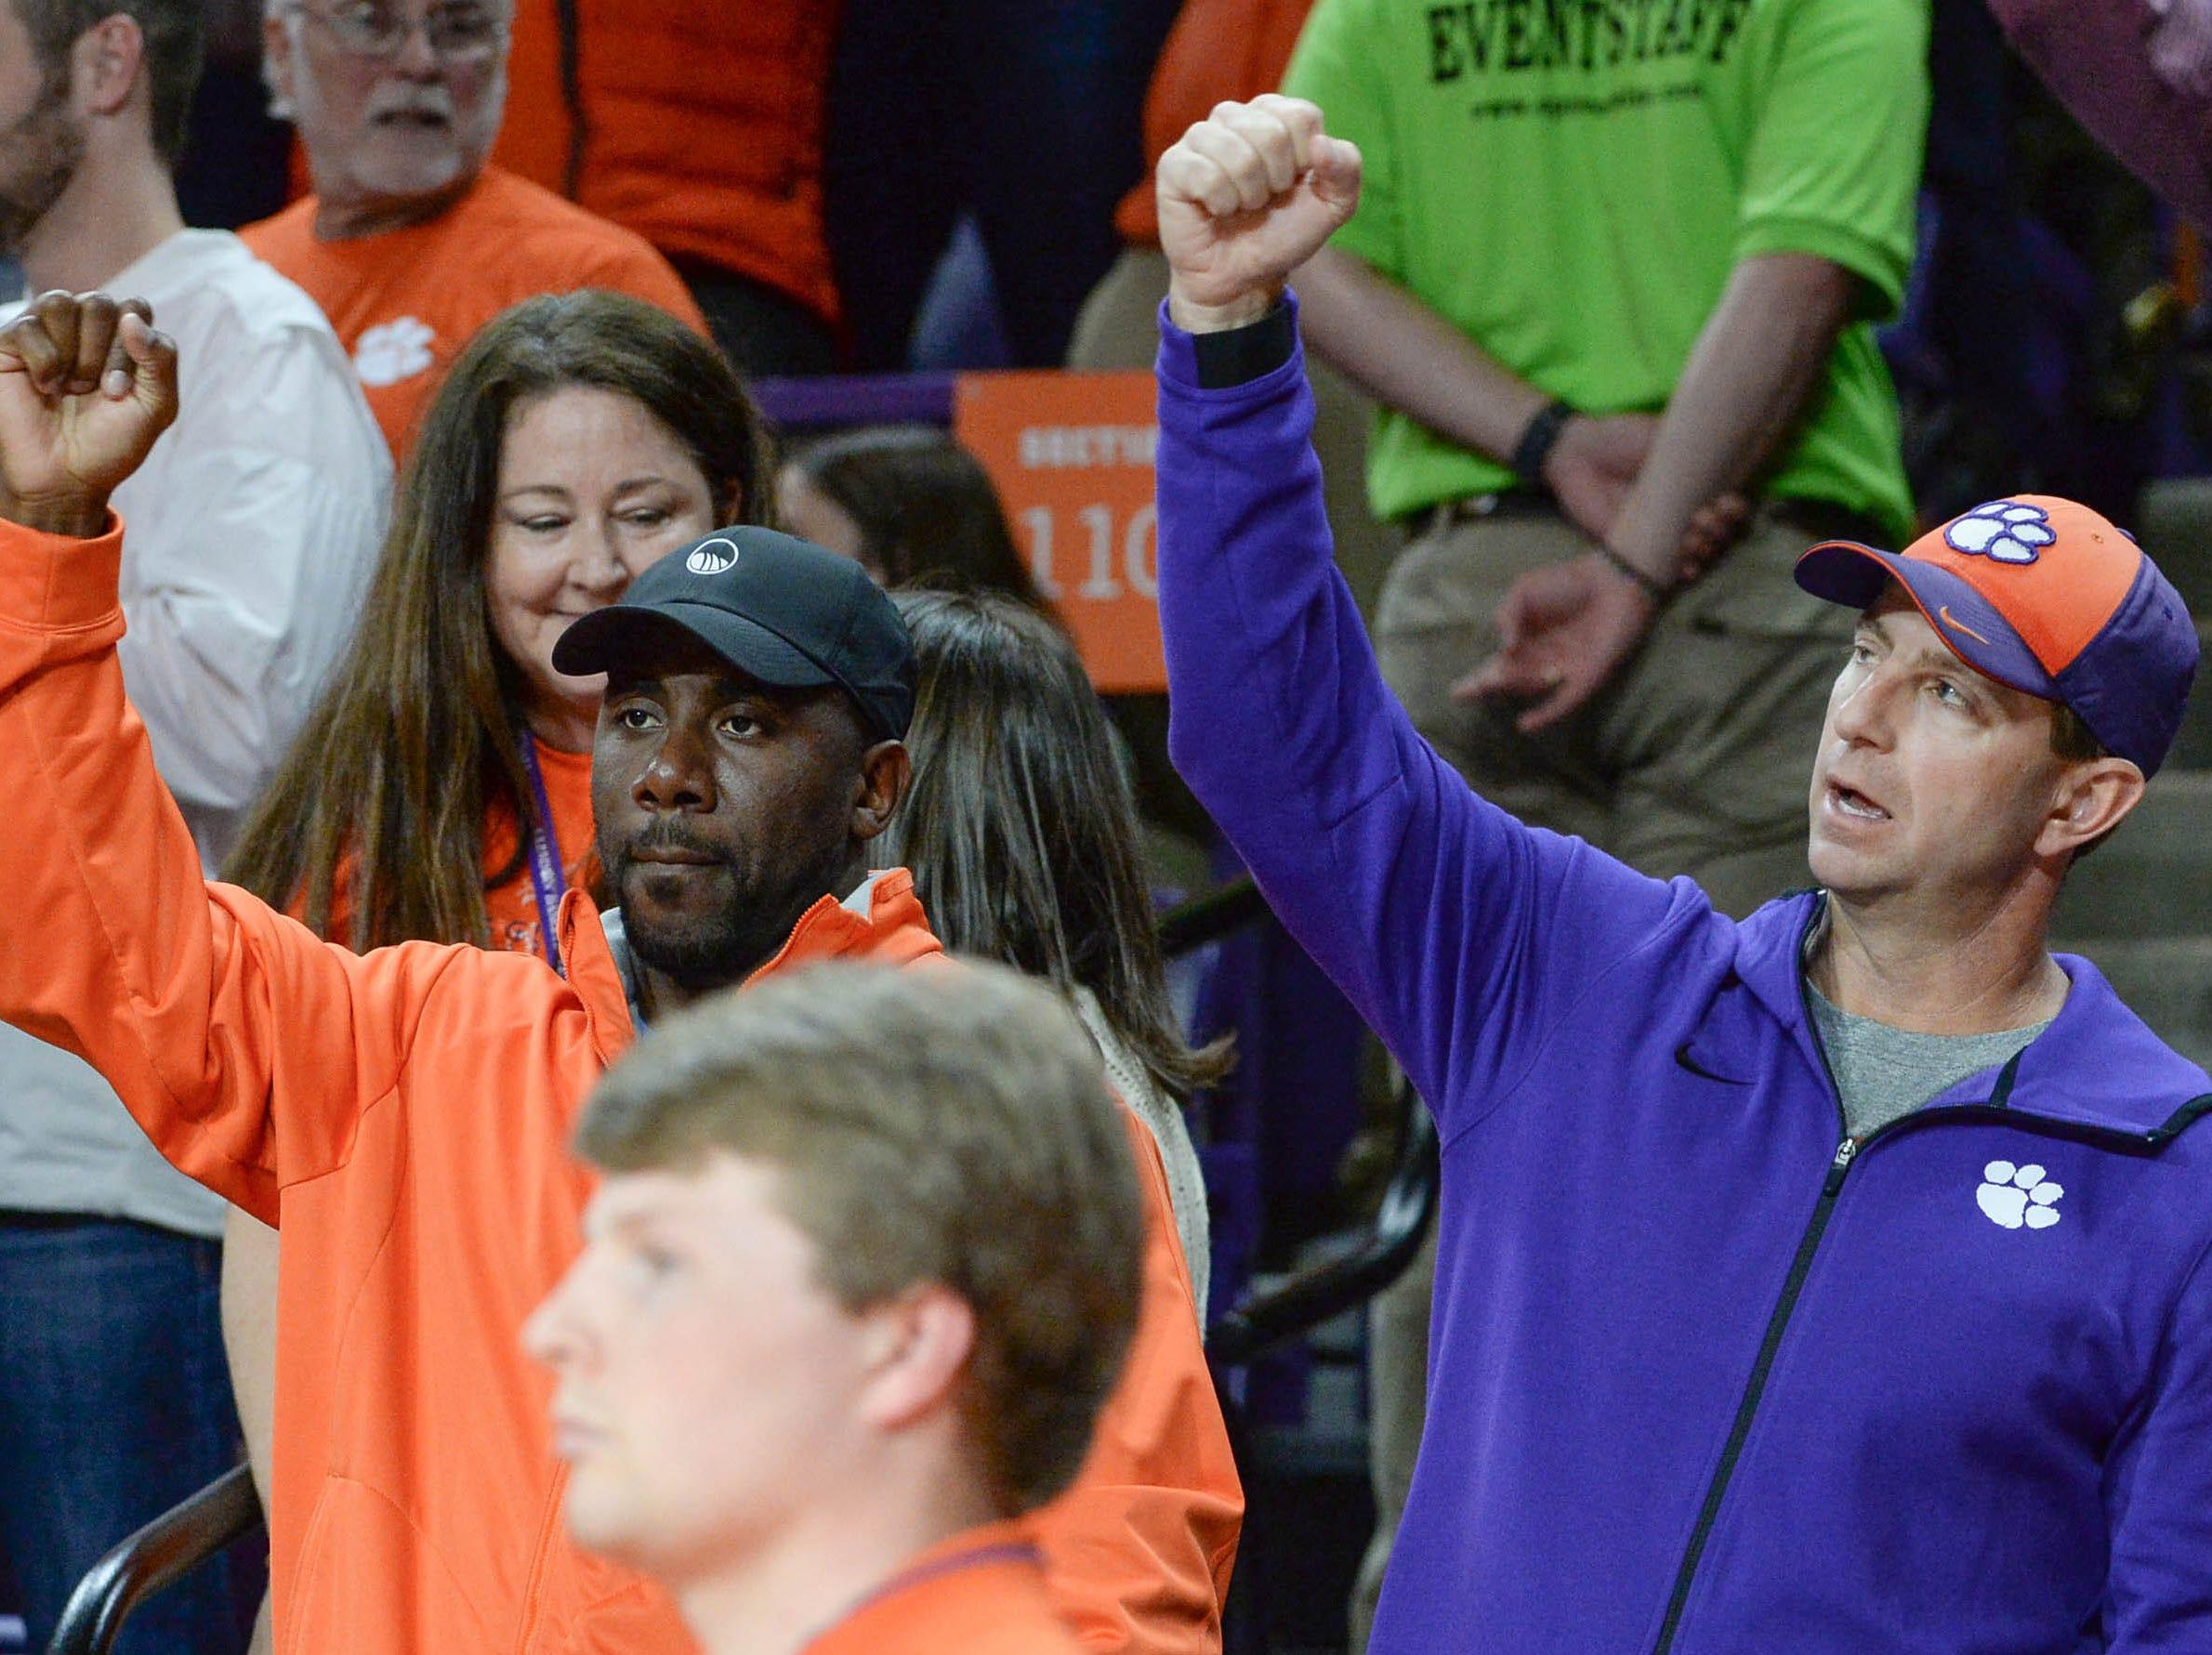 Former Clemson football player C.J. Spilller, left, and Clemson football coach Dabo Swinney cheer during the second half in Littlejohn Coliseum in Clemson Saturday, March 9, 2019.